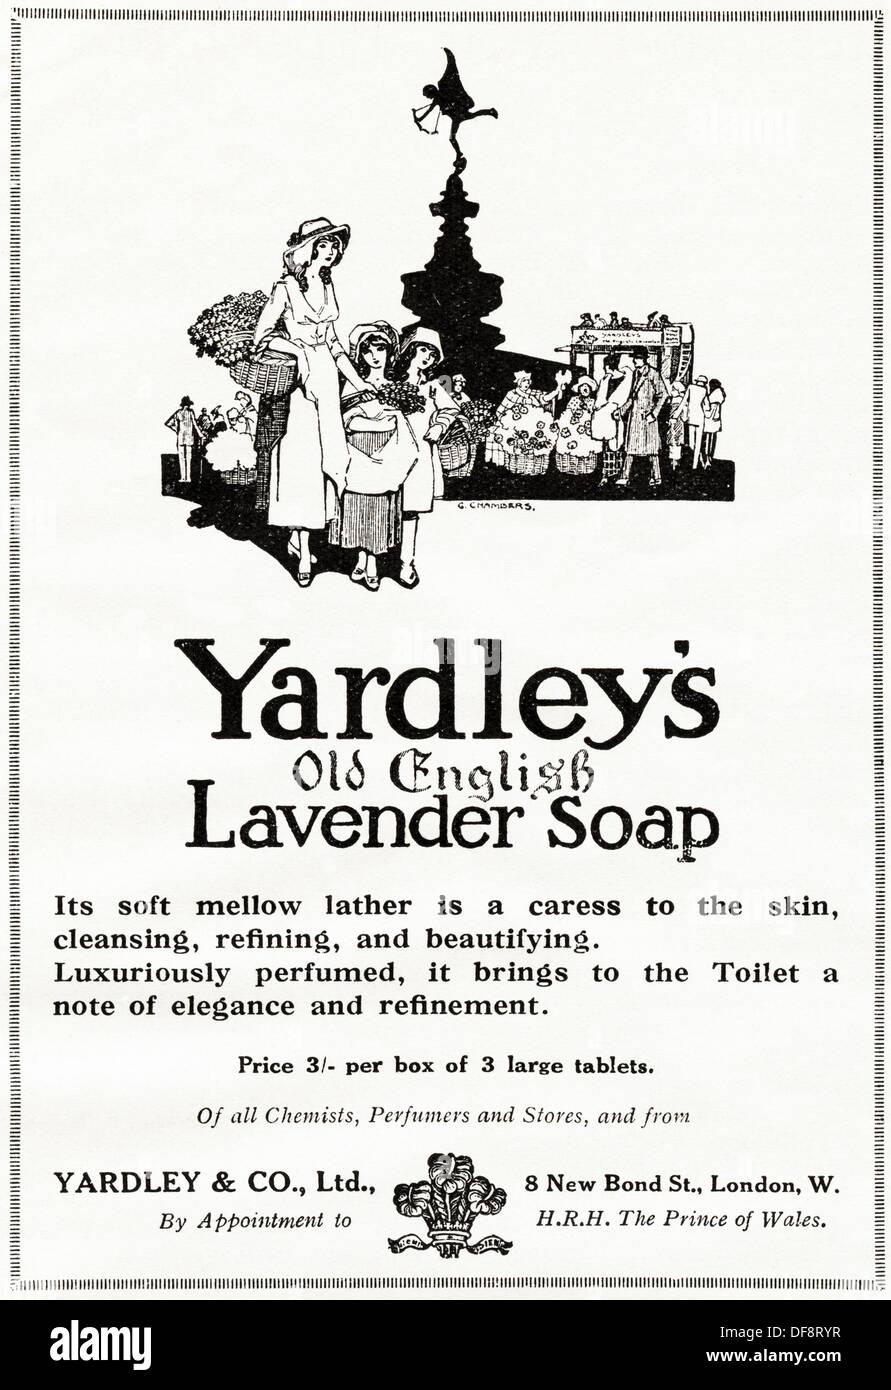 Original 1920s advertisement advertising YARDLEY'S OLD ENGLISH LAVENDER SOAP, consumer magazine advert circa 1924 Stock Photo